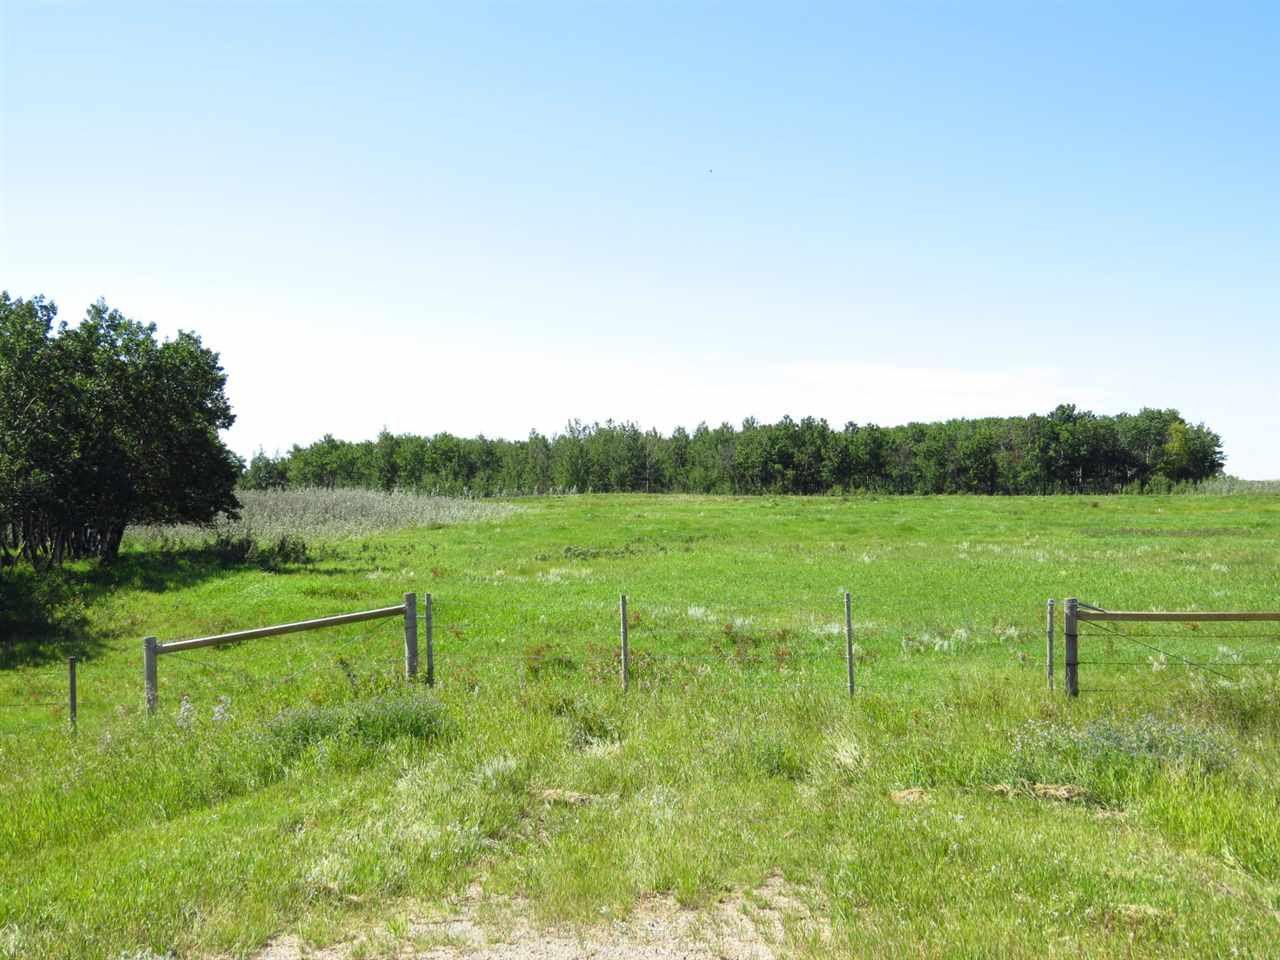 Main Photo: NE-26-41 -8-w4: Rural Provost M.D. Rural Land/Vacant Lot for sale : MLS®# E4154433